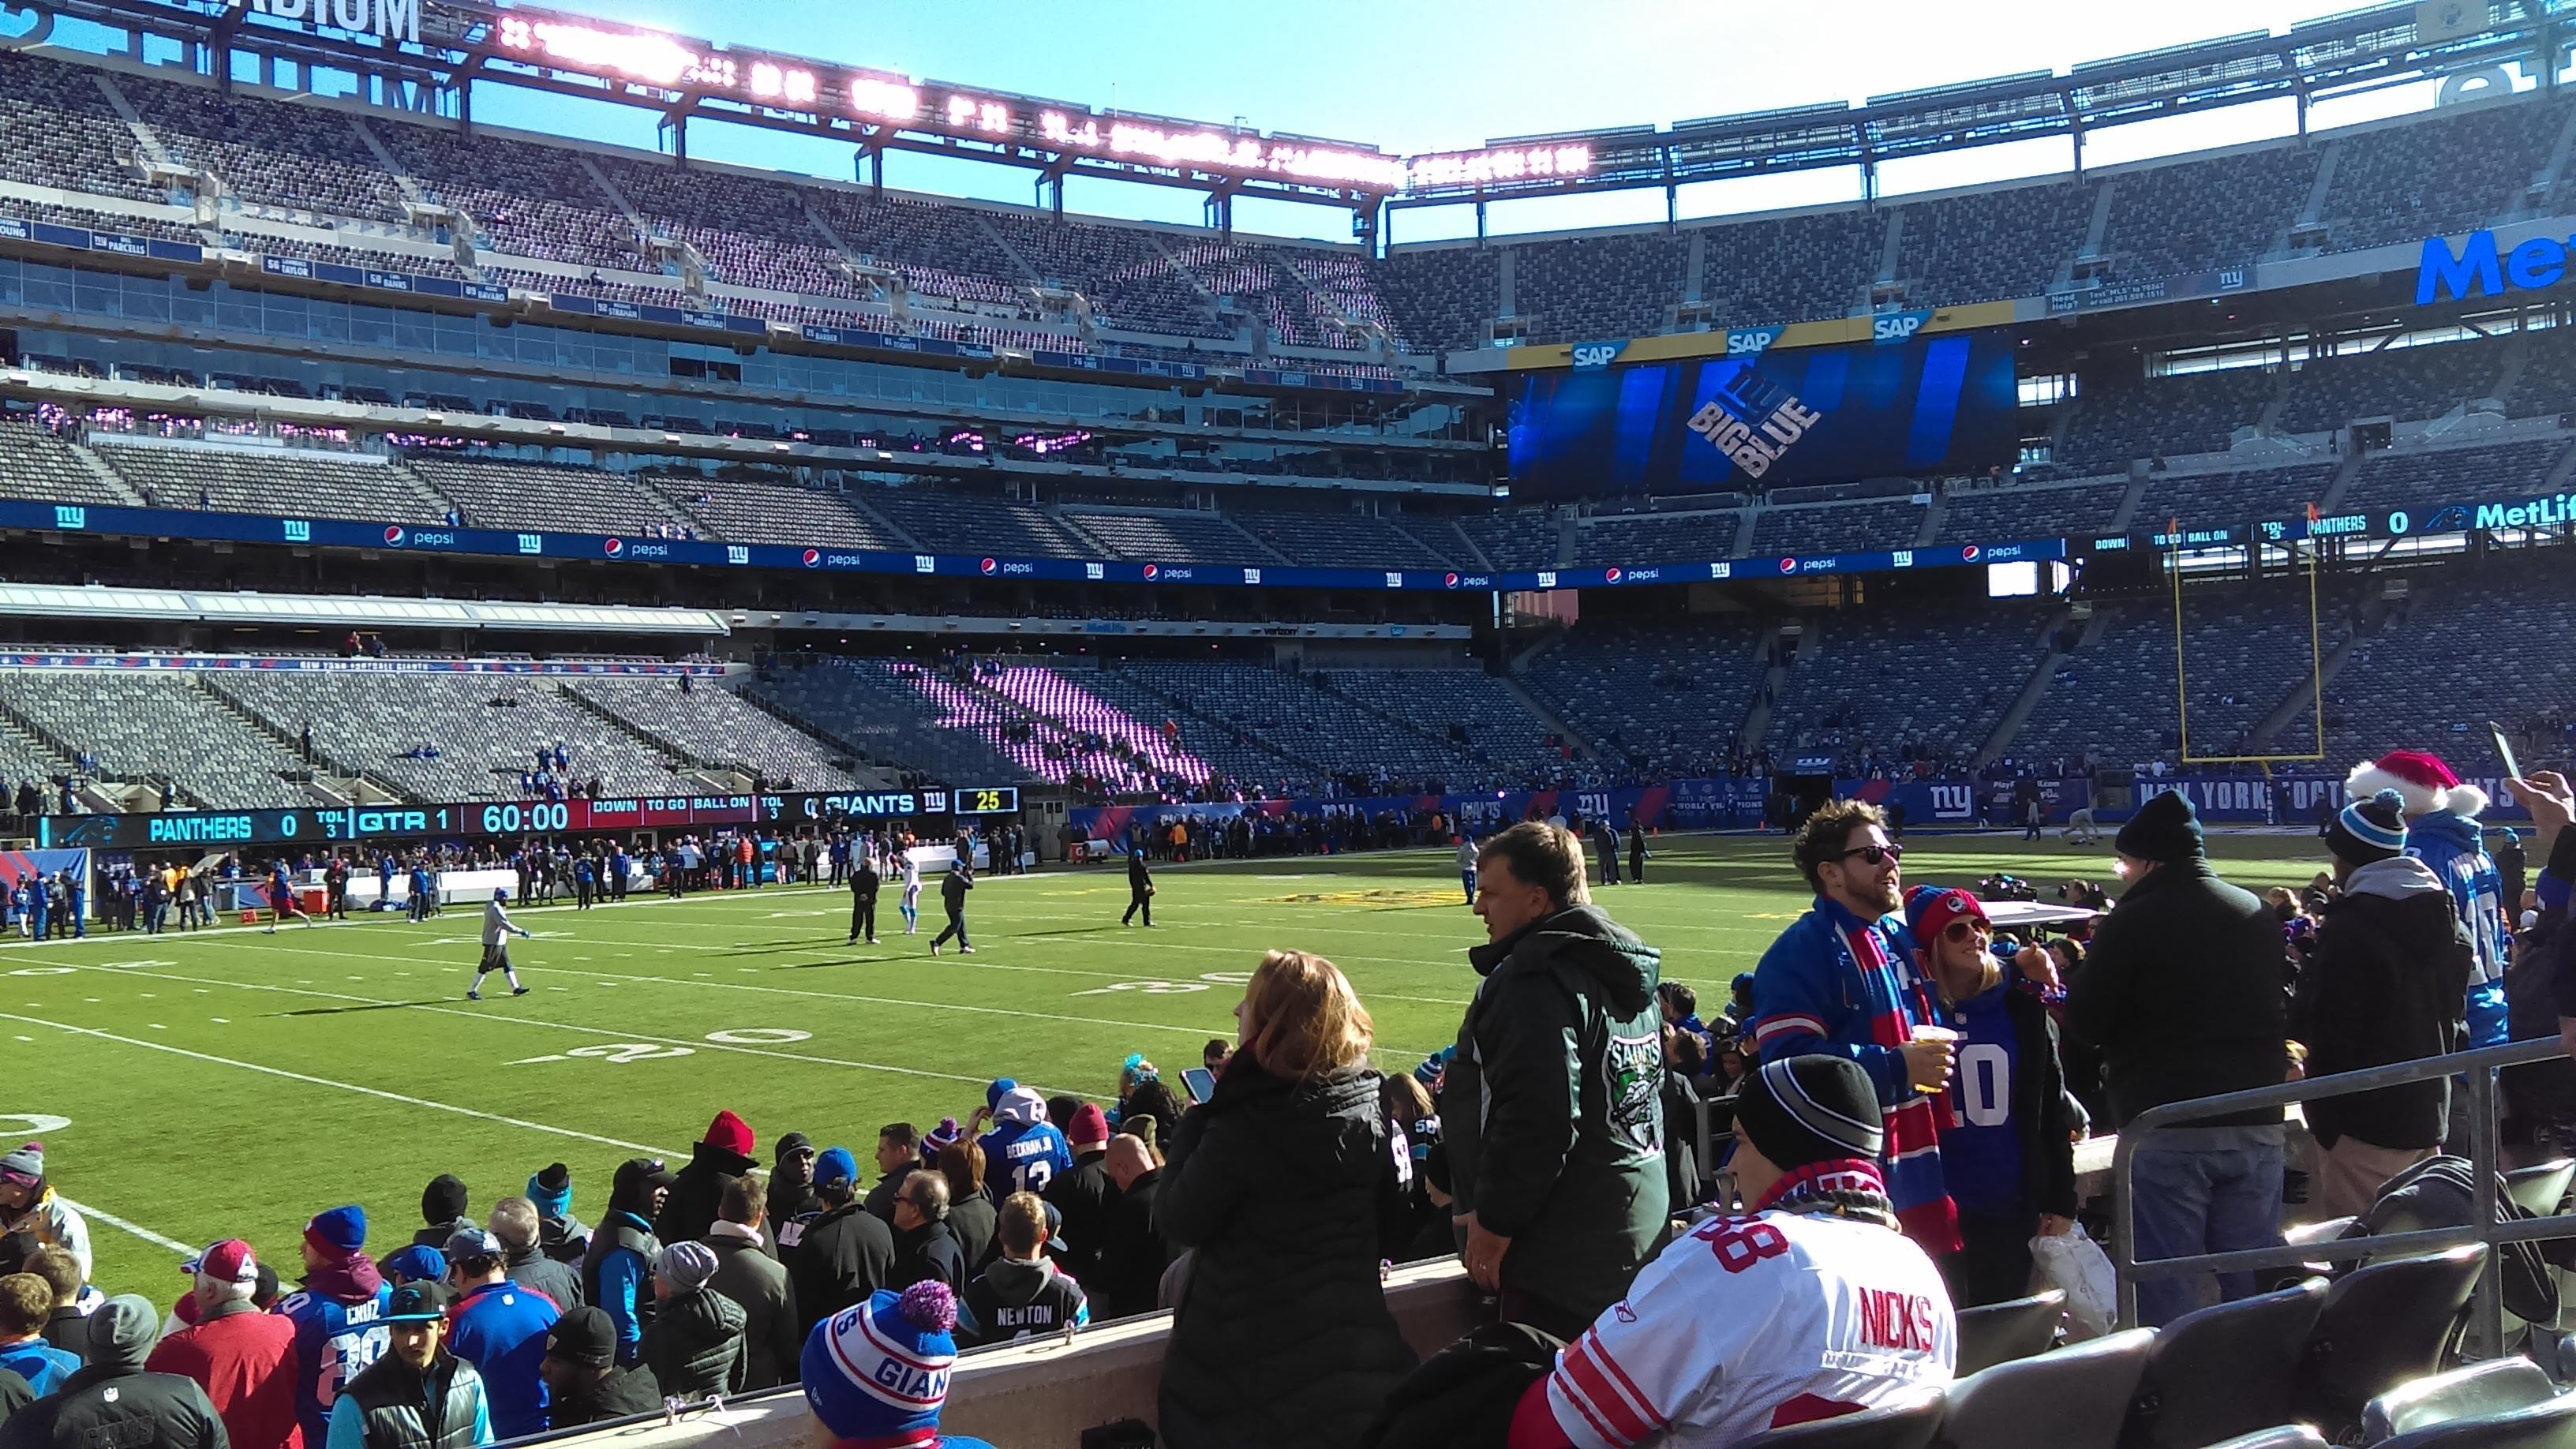 MetLife Stadium Section 143 Row 5 Seat 8